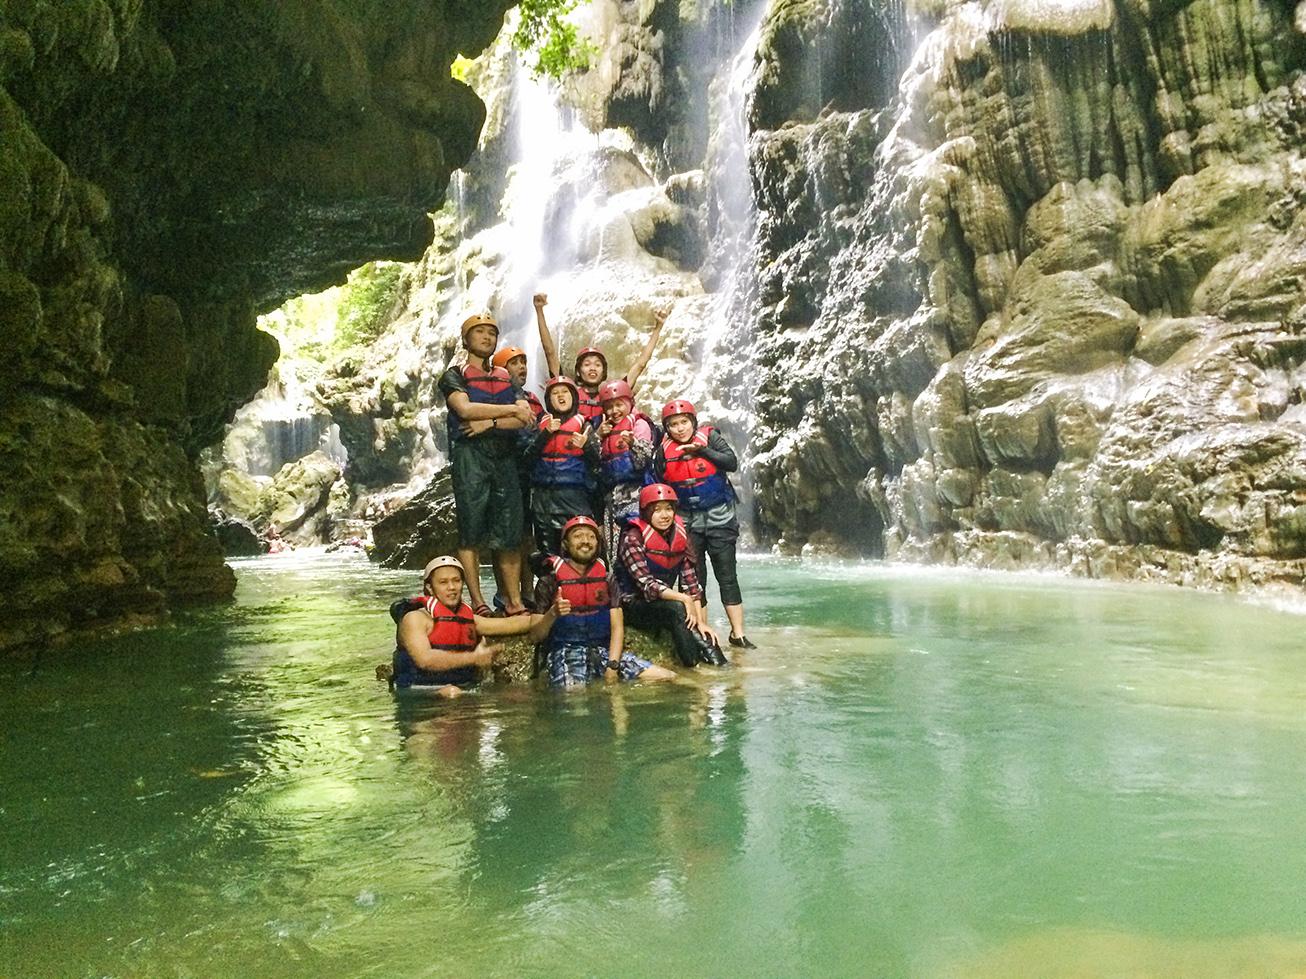 informasi body rafting di green canyon pangandaran